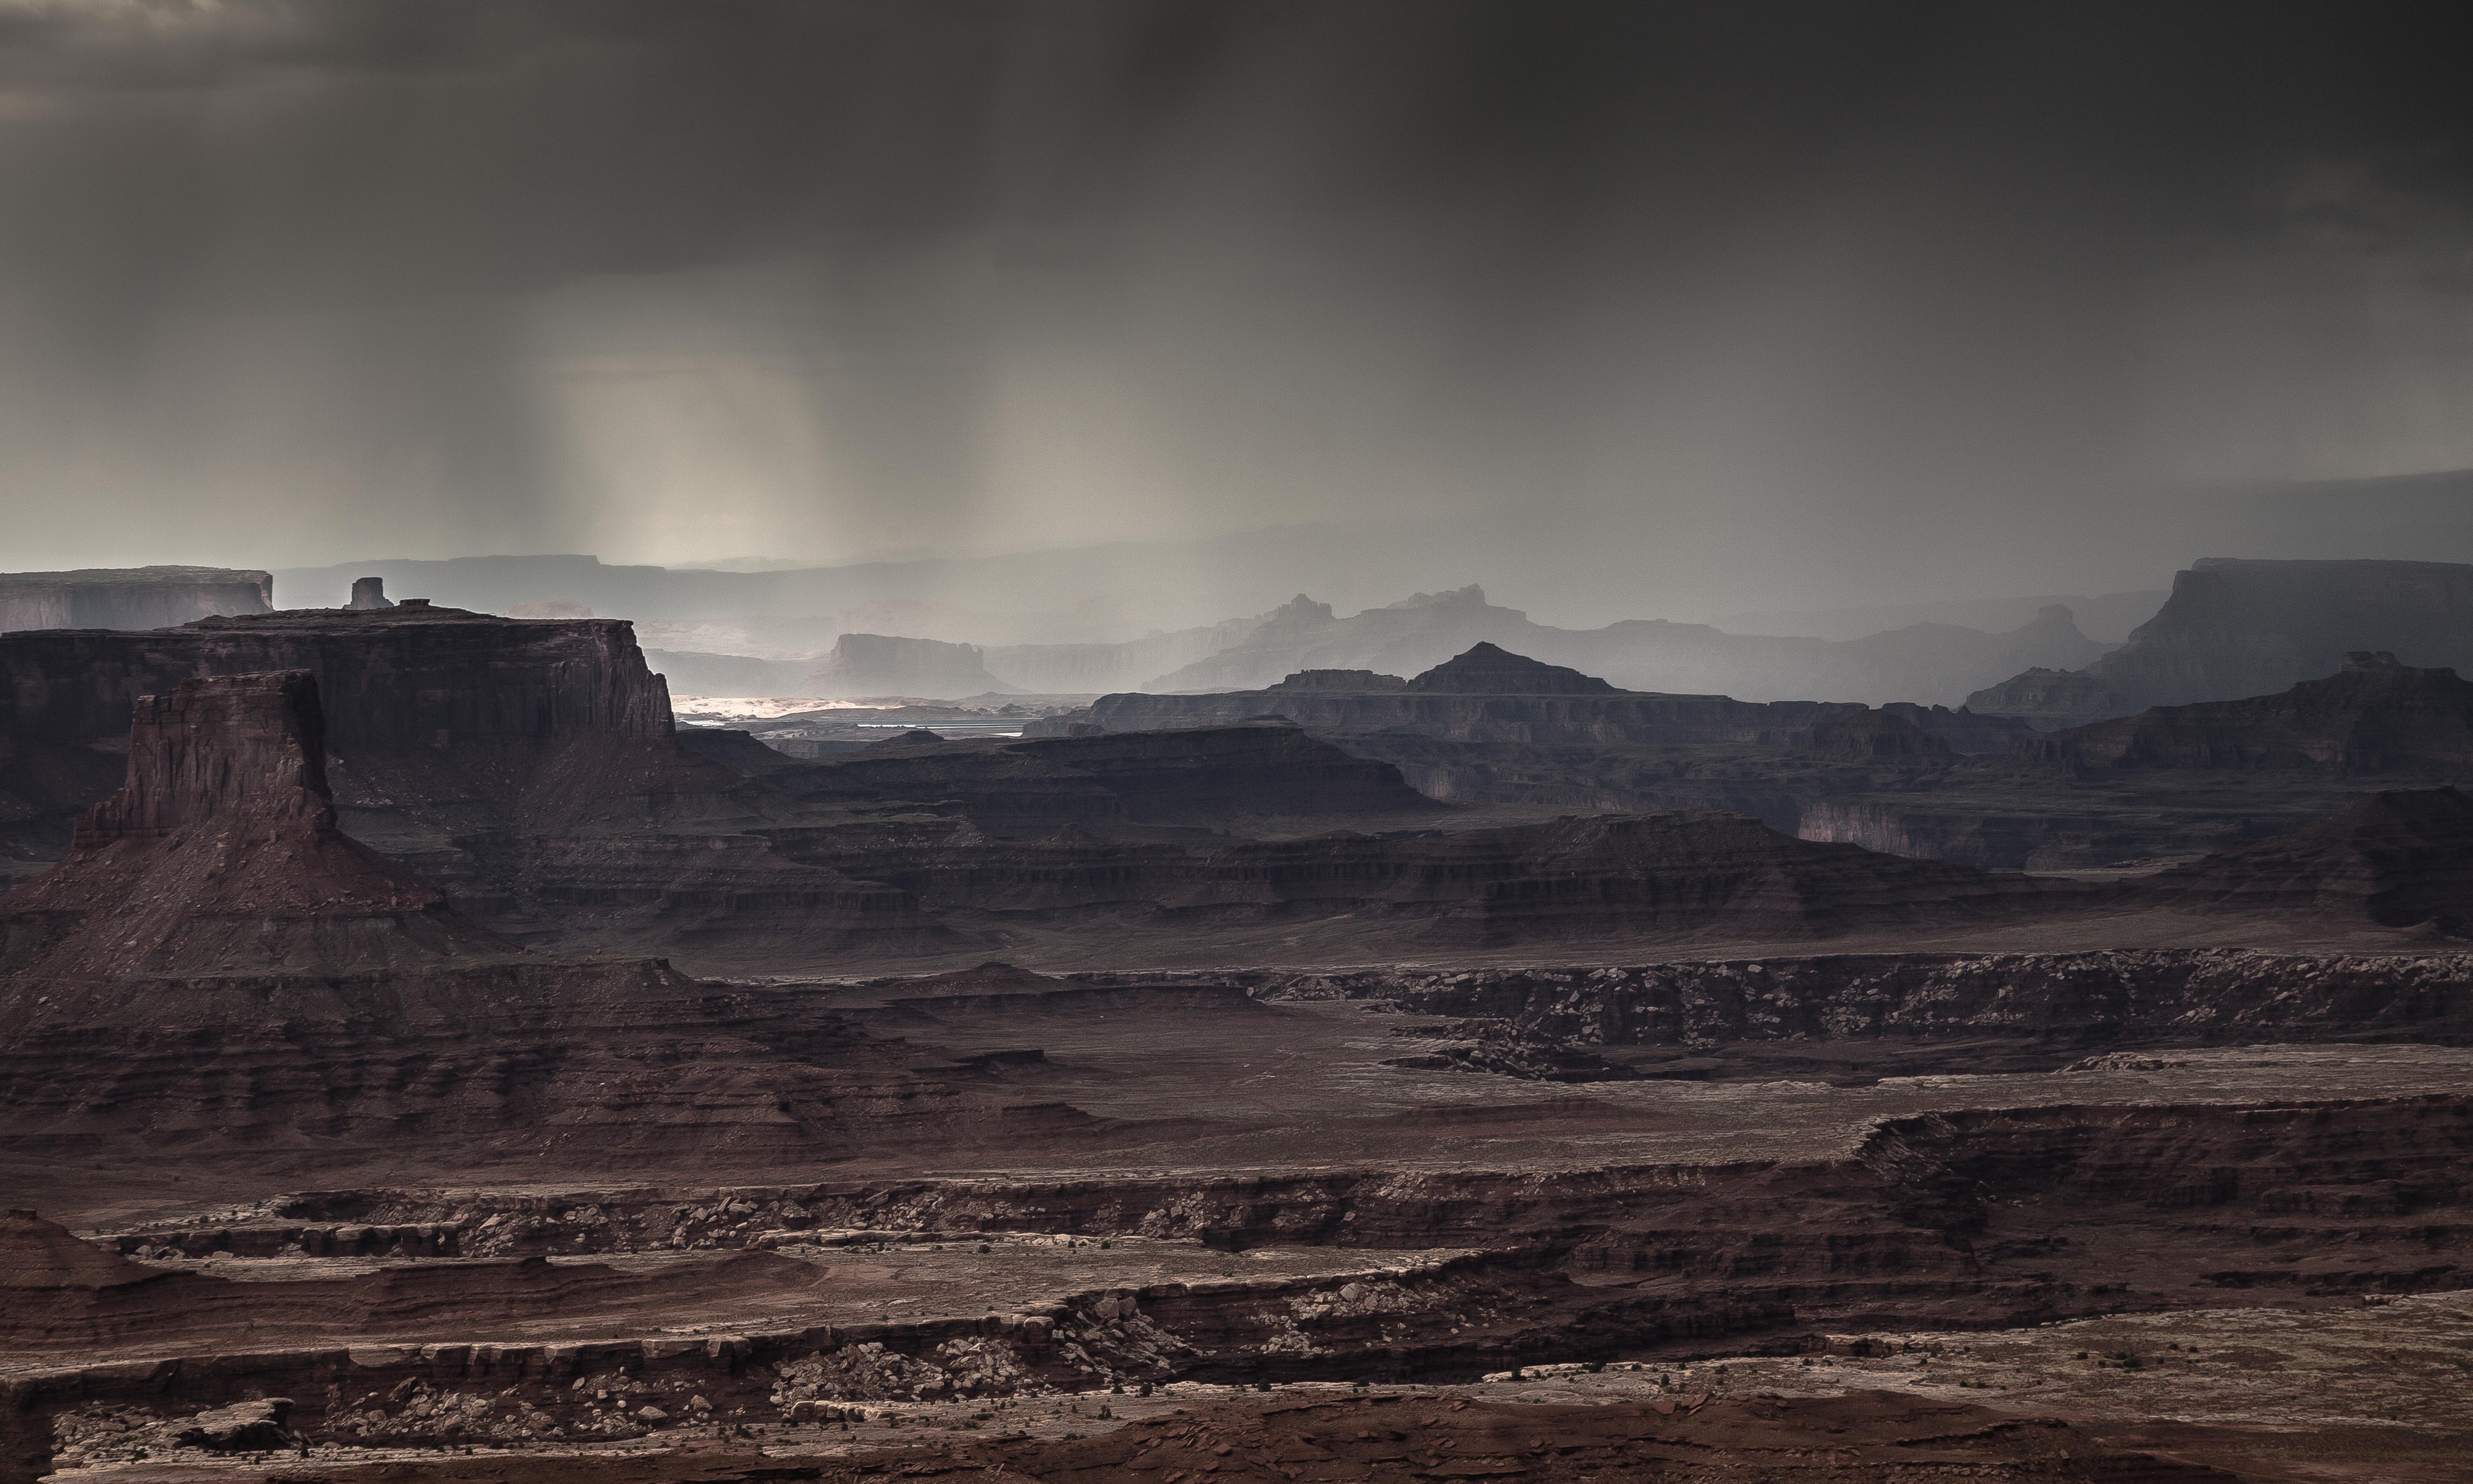 Wallpaper Landscape Rock Rain Storm Mist Sun Valley Mars Utah Western Plateau Vista Light 24105usml Canon5dmarkii Canyonlands Virga